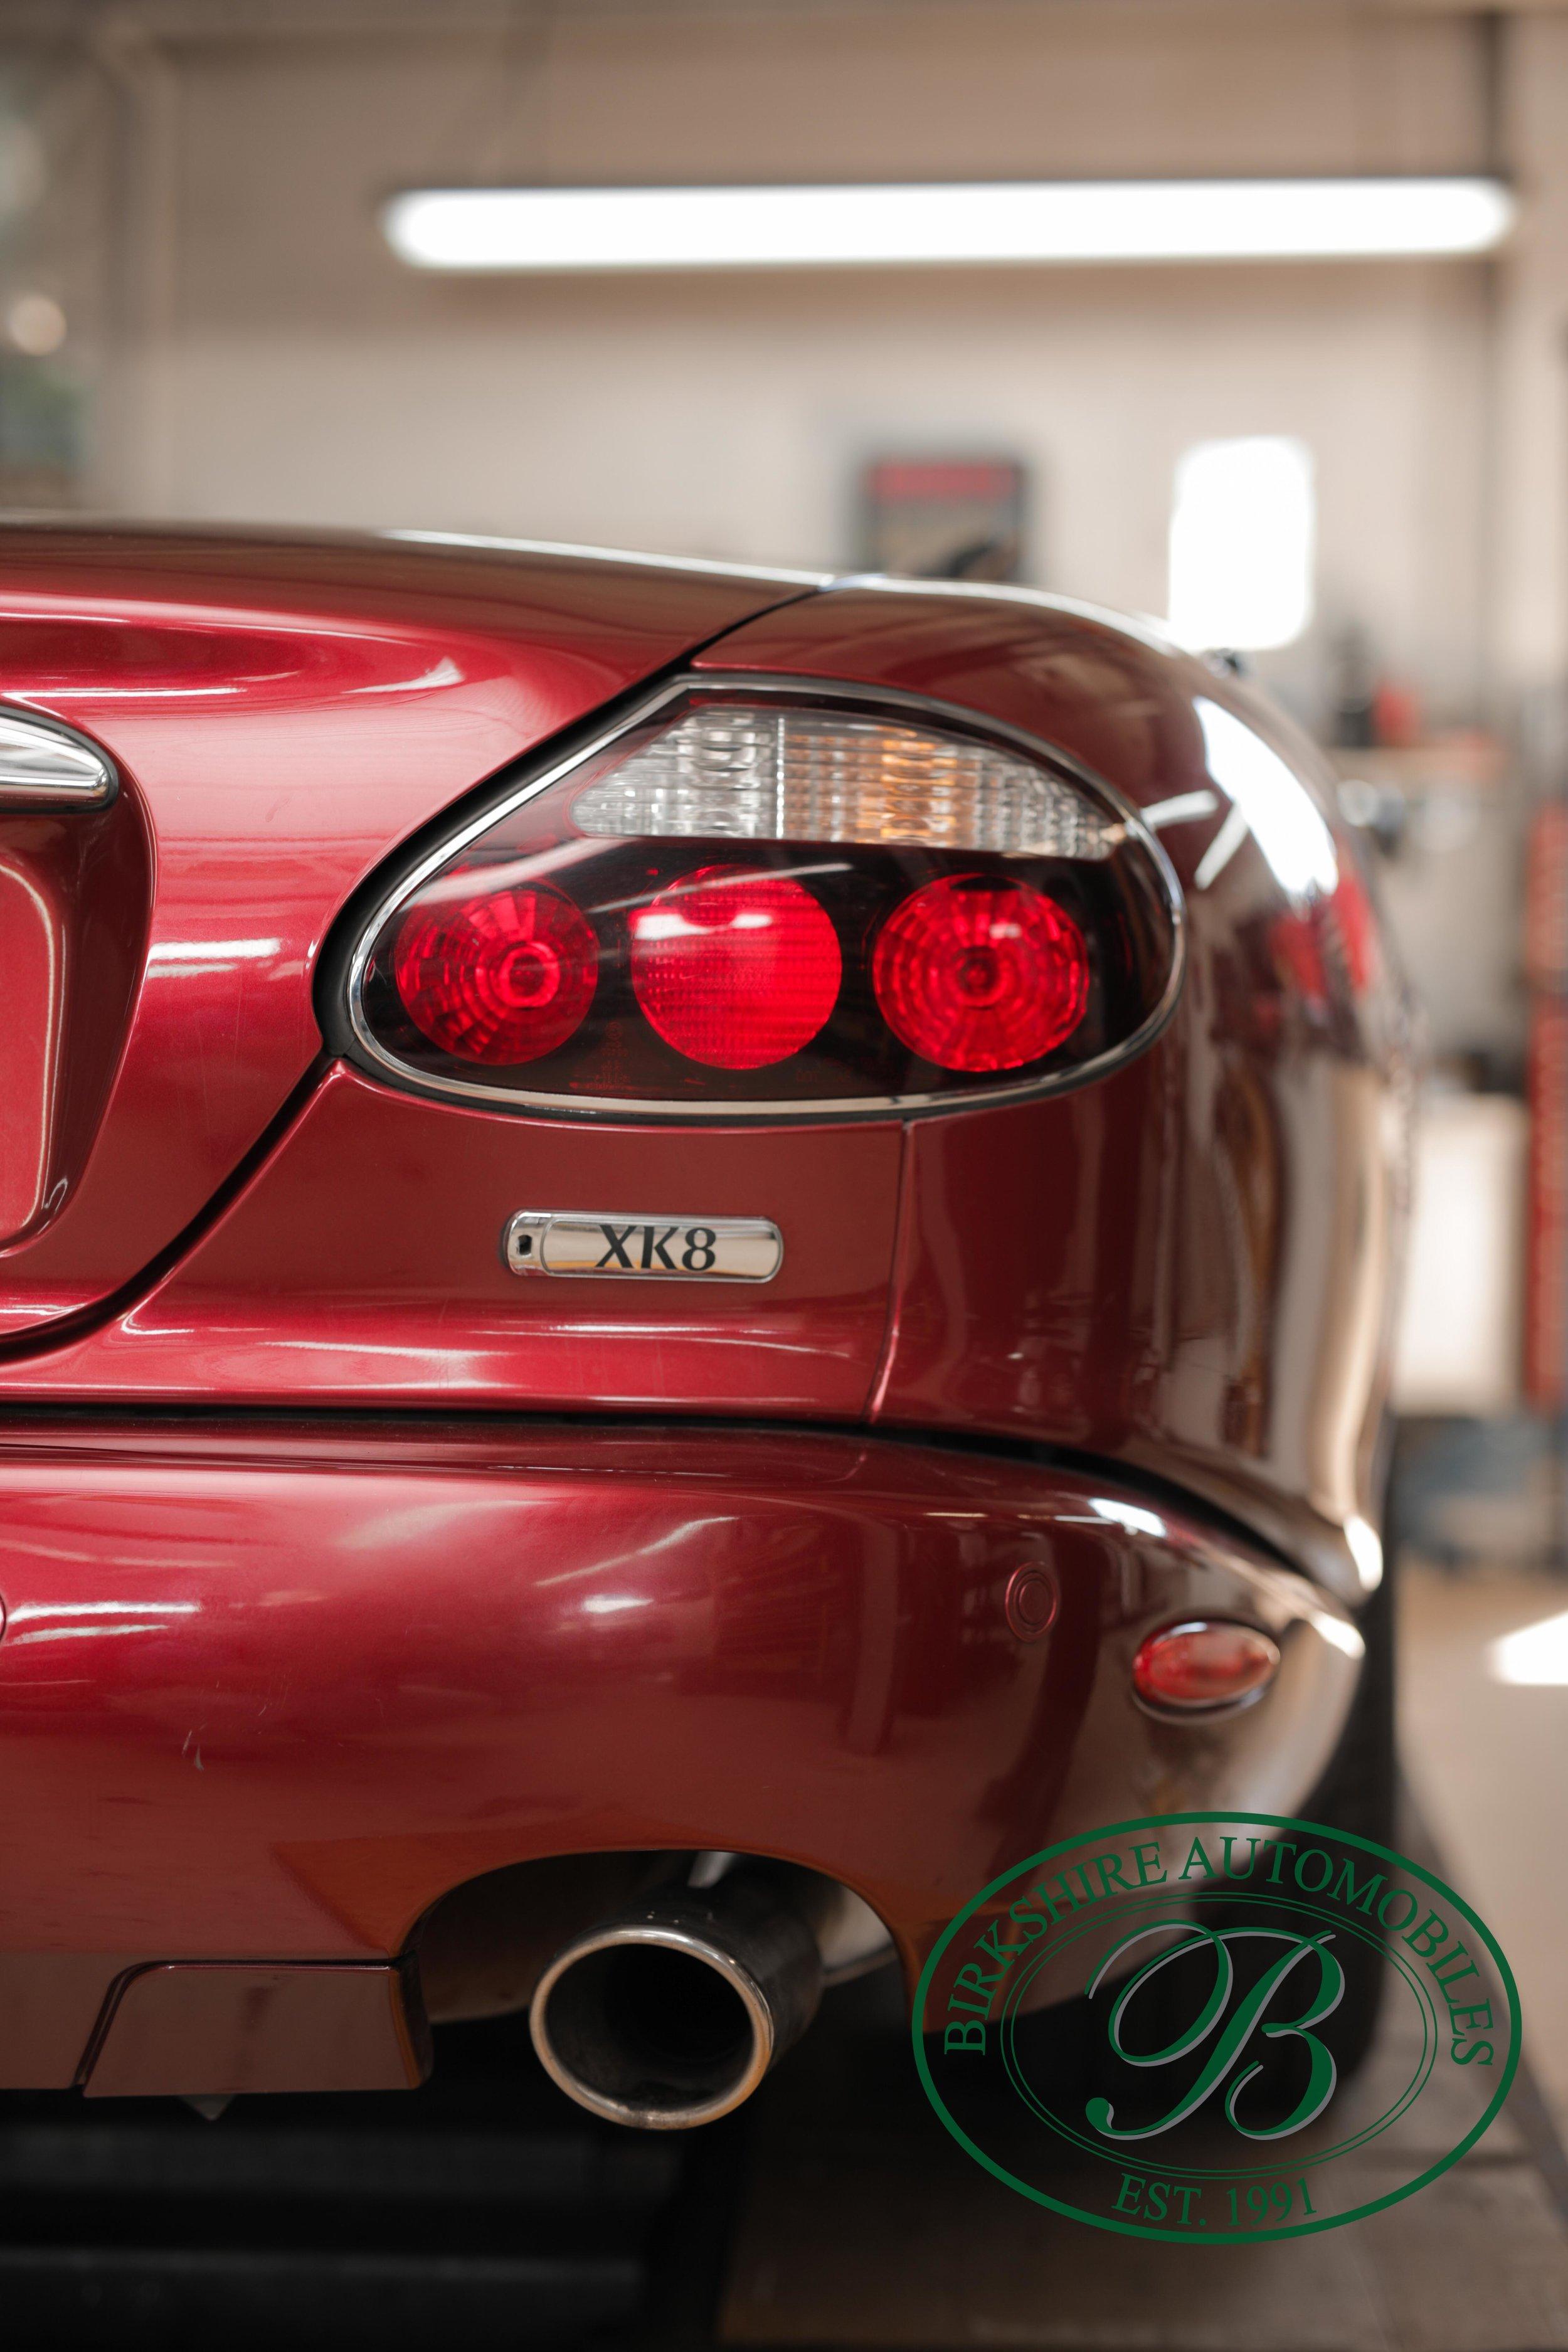 Birkshire Automobiles Britsh Car Service 2008 Jaguar XK8 Convertible-6.jpg